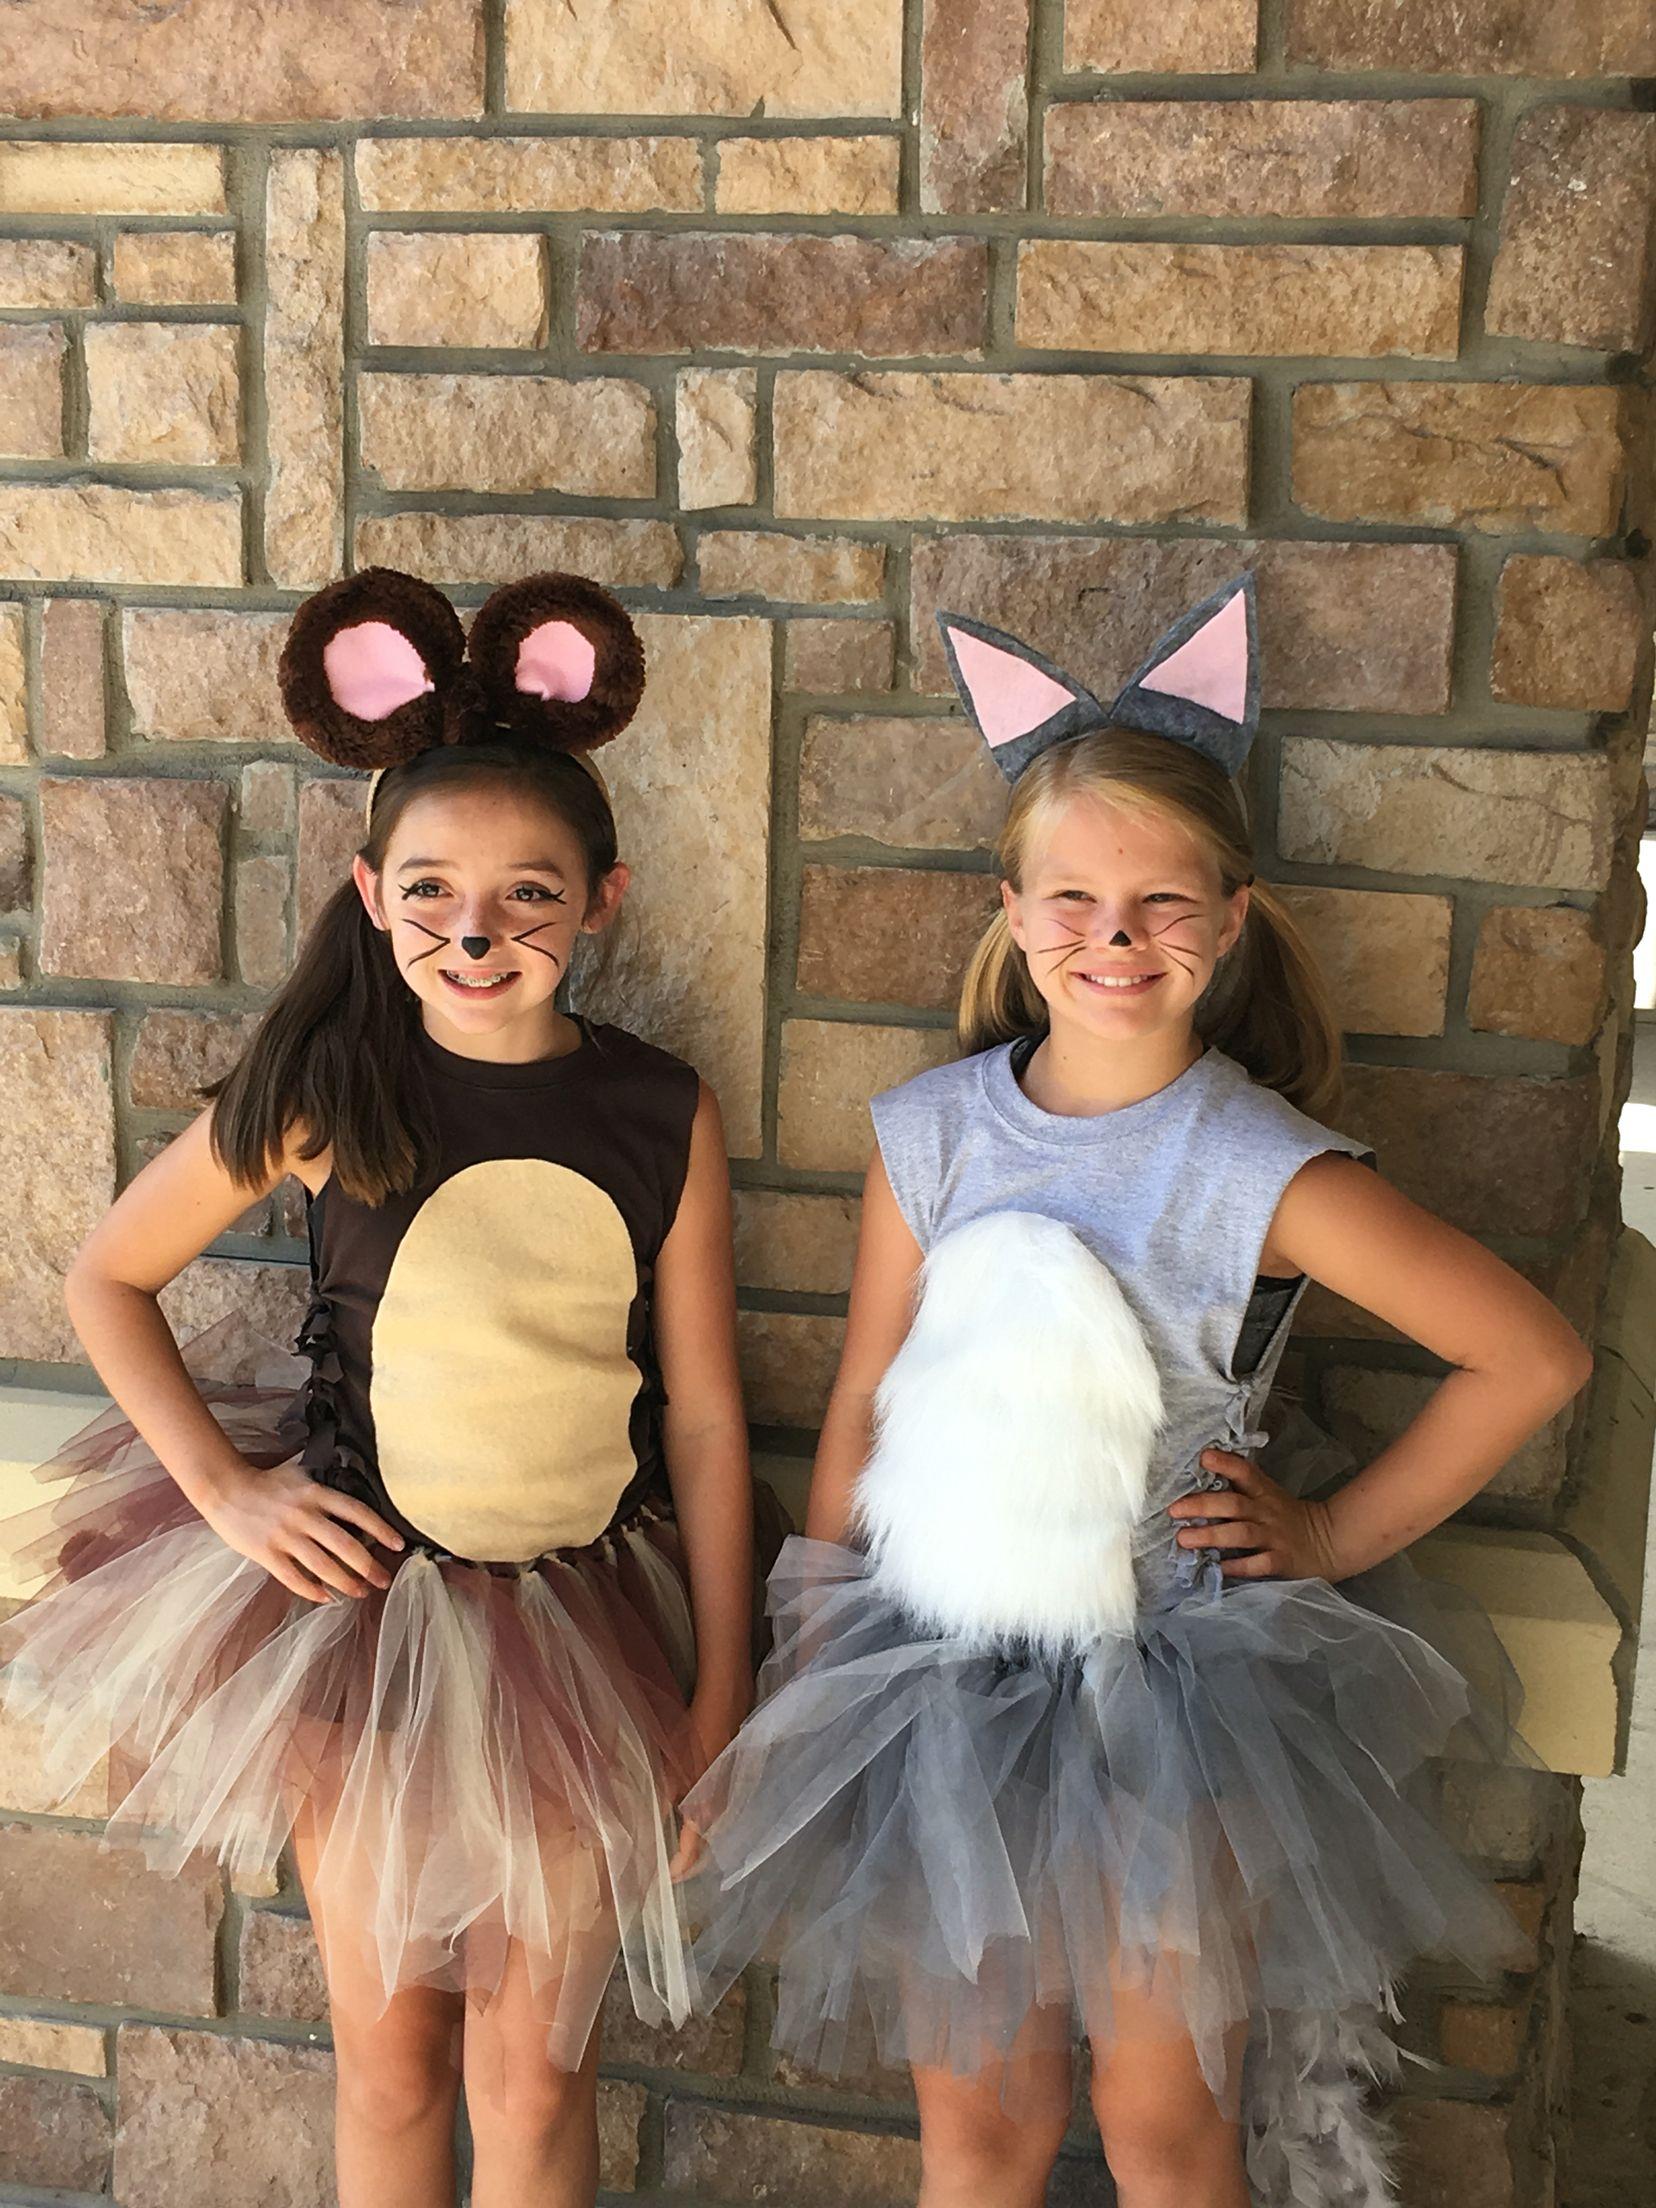 Tom and Jerry diy costume cheer camp Tu Tu